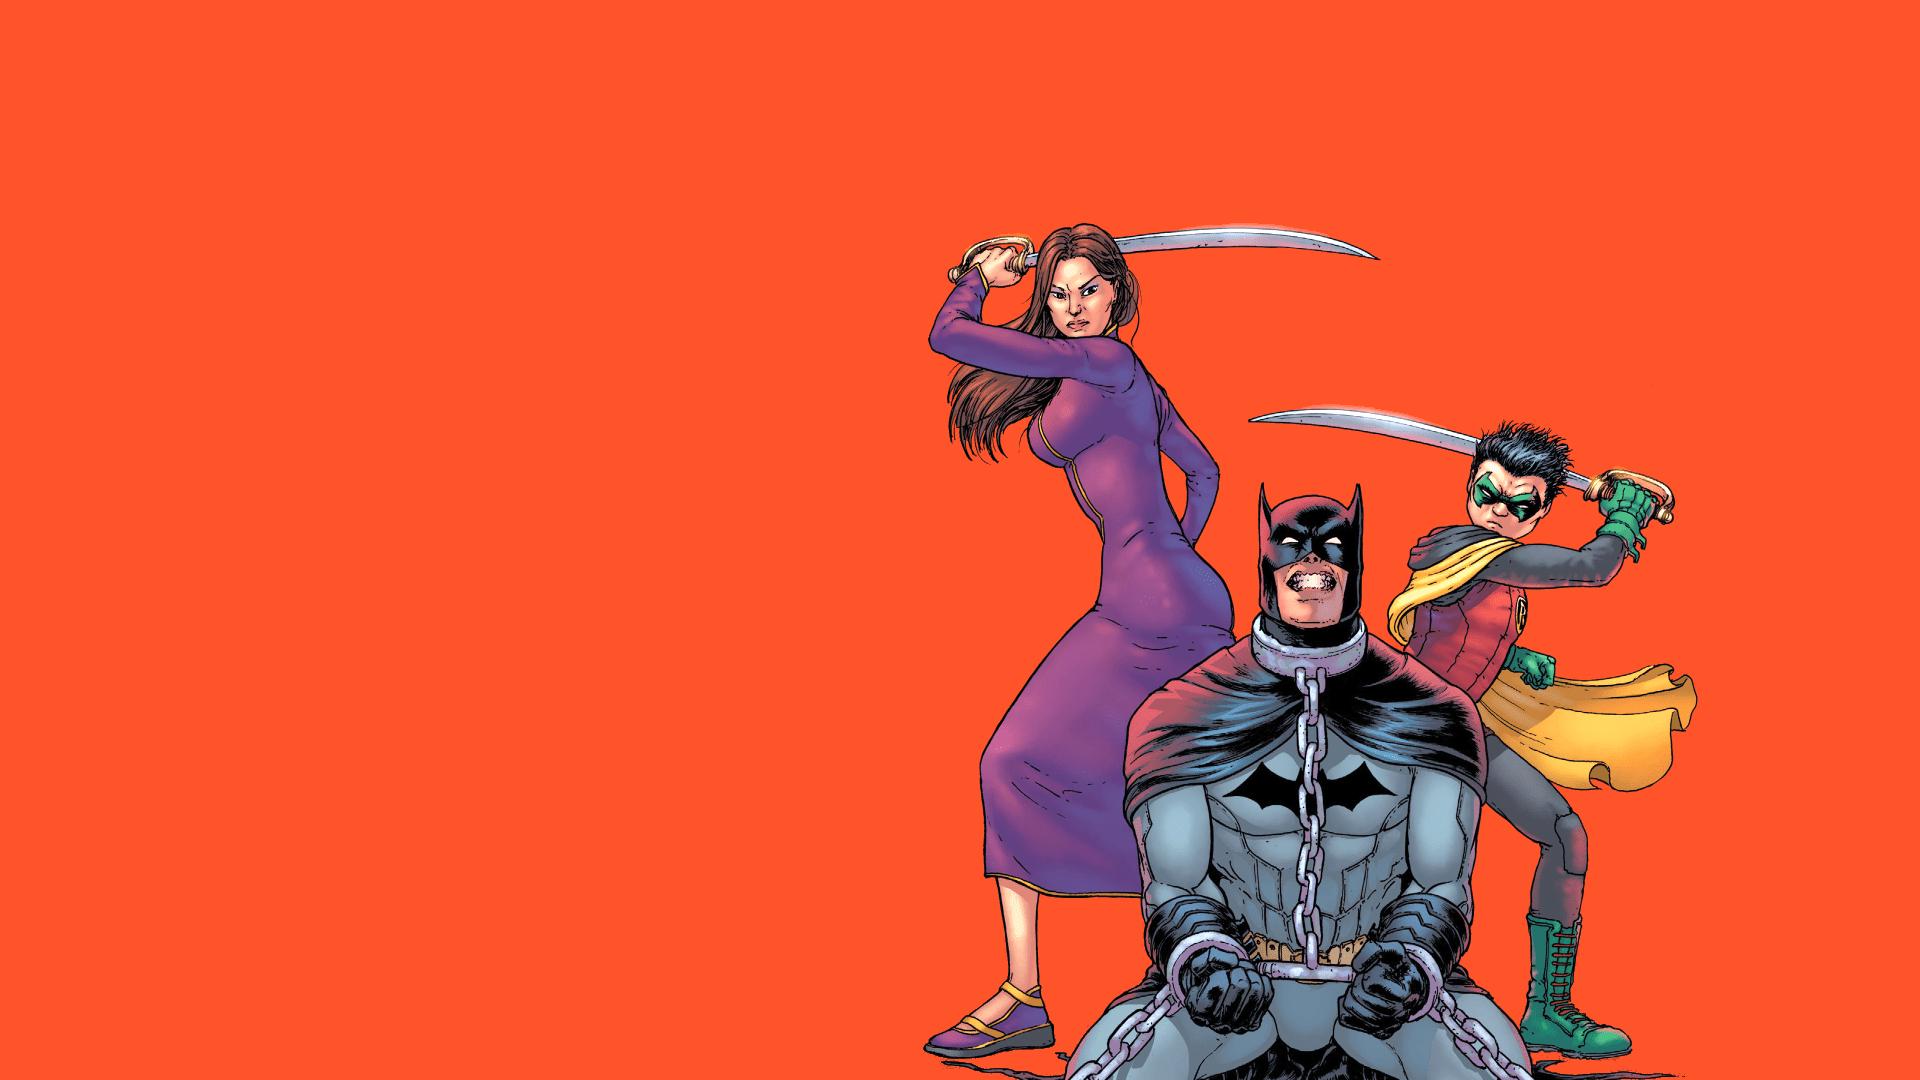 Batman & Robin Hd Wallpaper  Background Image  1920x1080